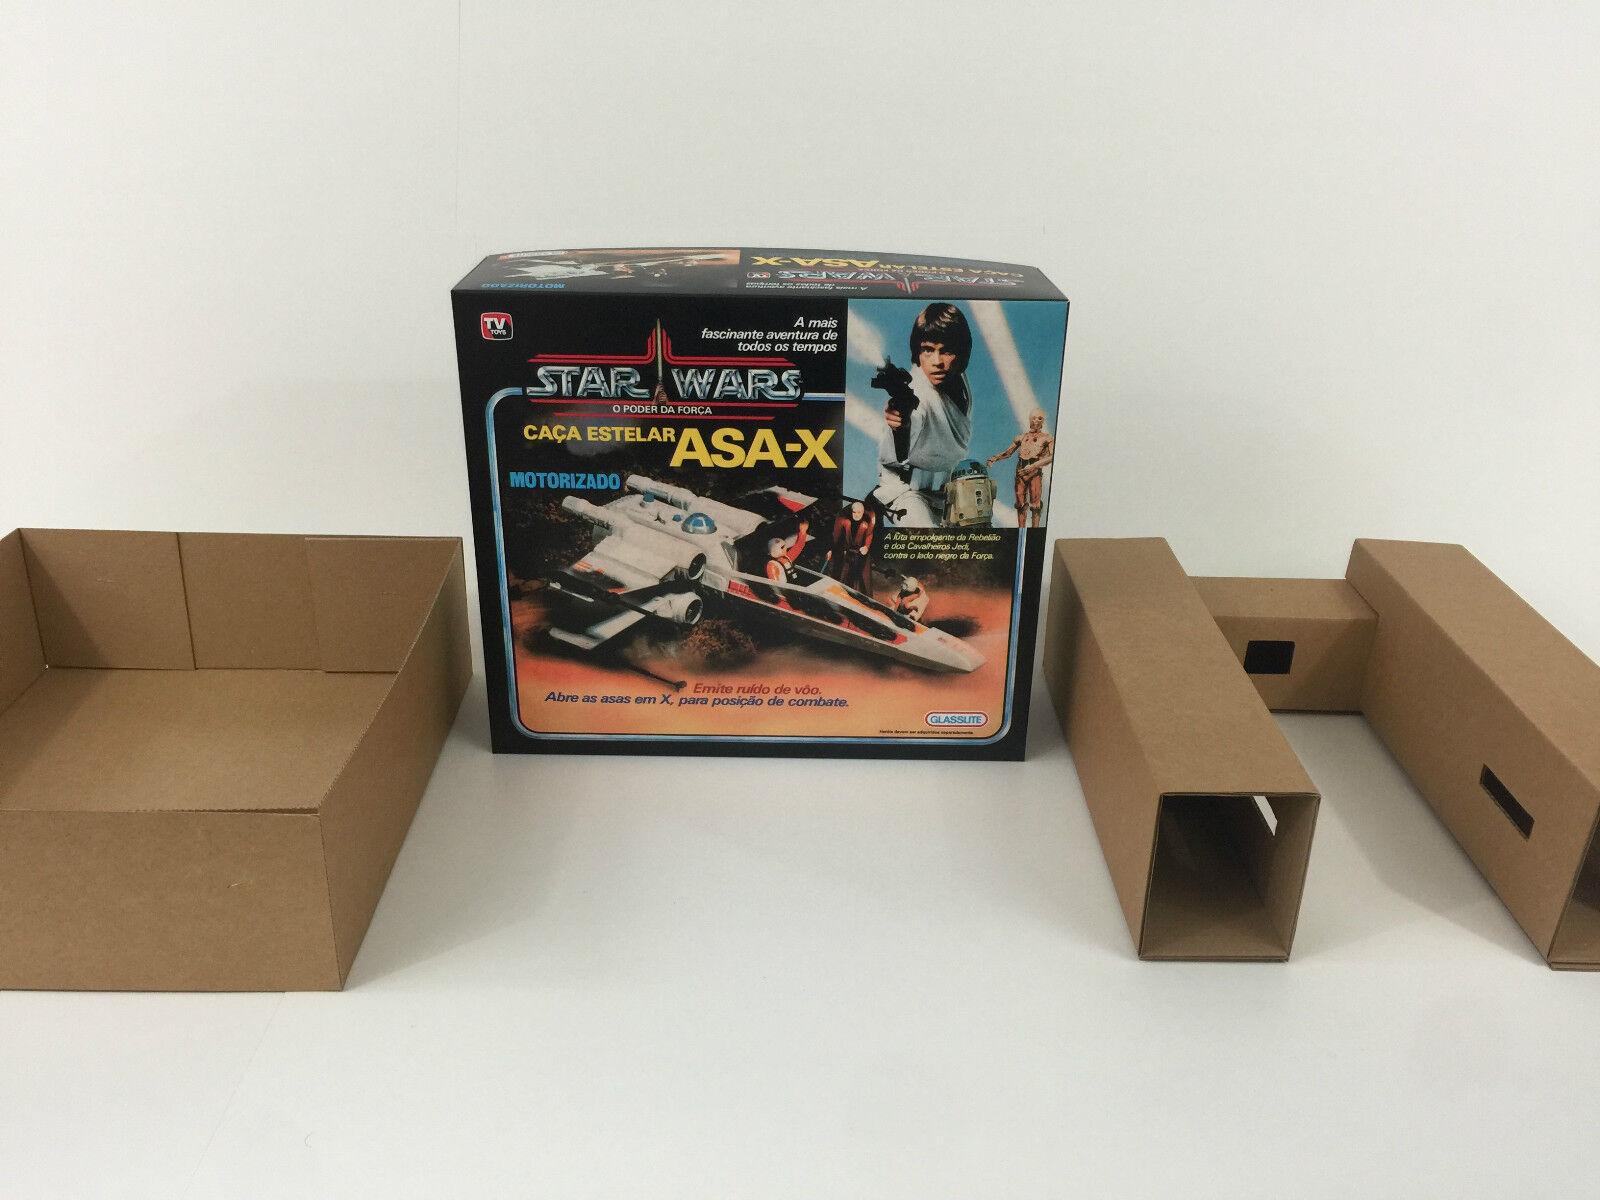 Replacement vinatge star wars glasslite asa-x  x-wing box + inserts